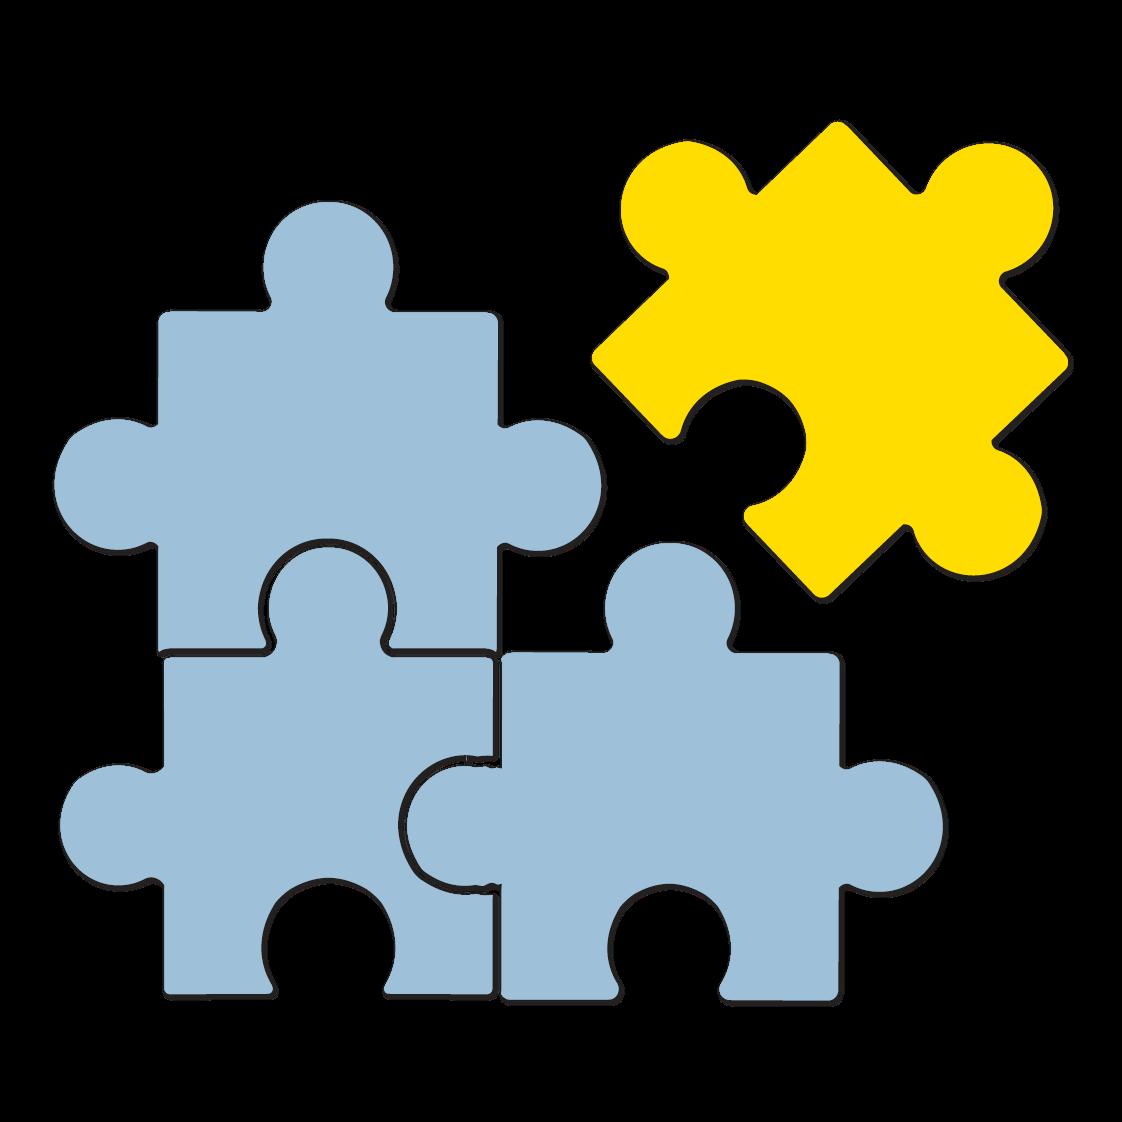 Puzzle-design-Emera-ideaHUB.png